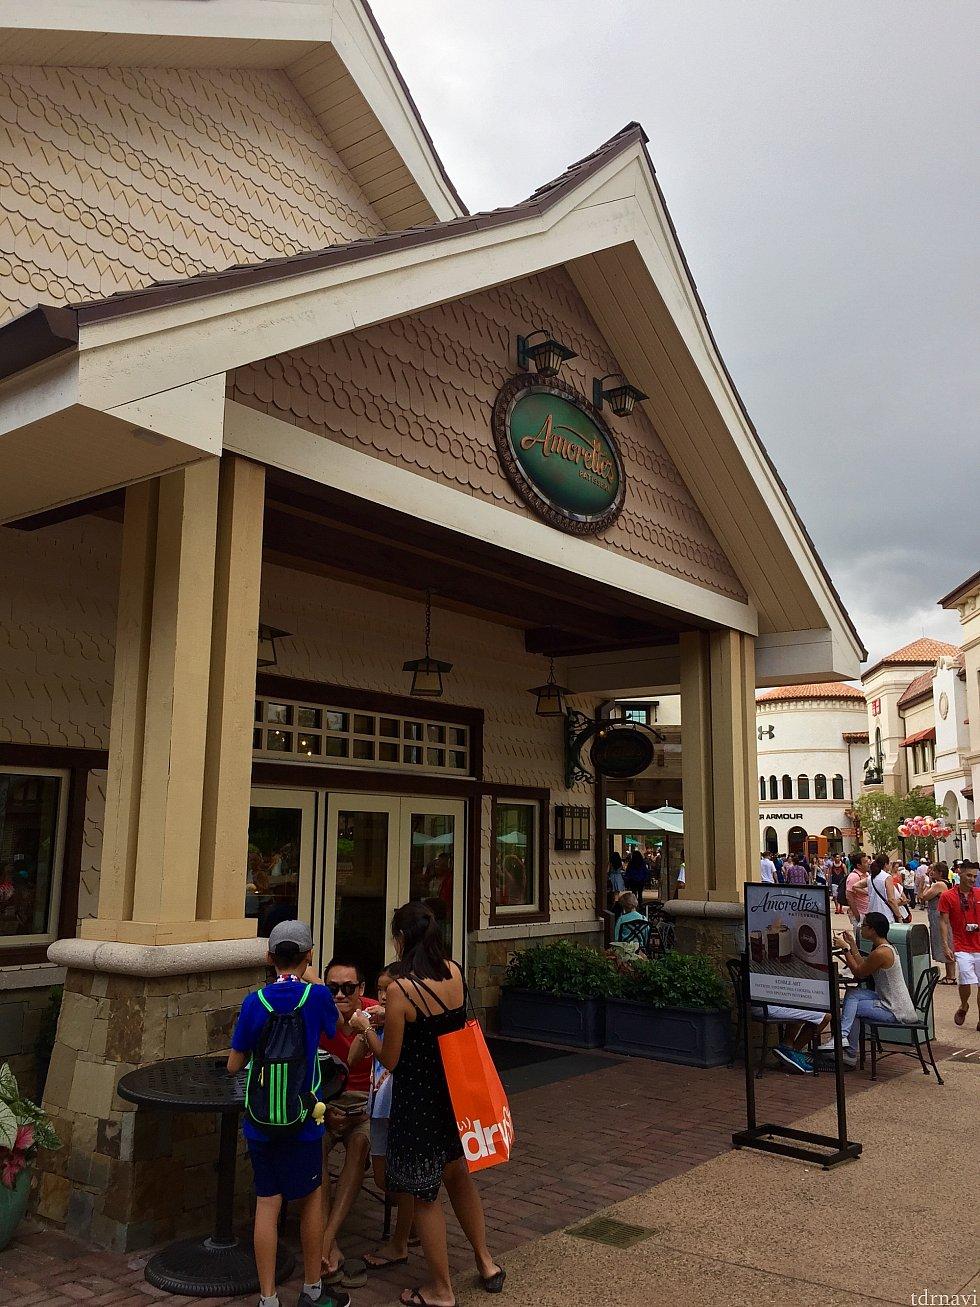 Amorette's Patisserie の入口は、世界最大のディズニーショップWorld of Disneyとリーバイスショップの間にあります。